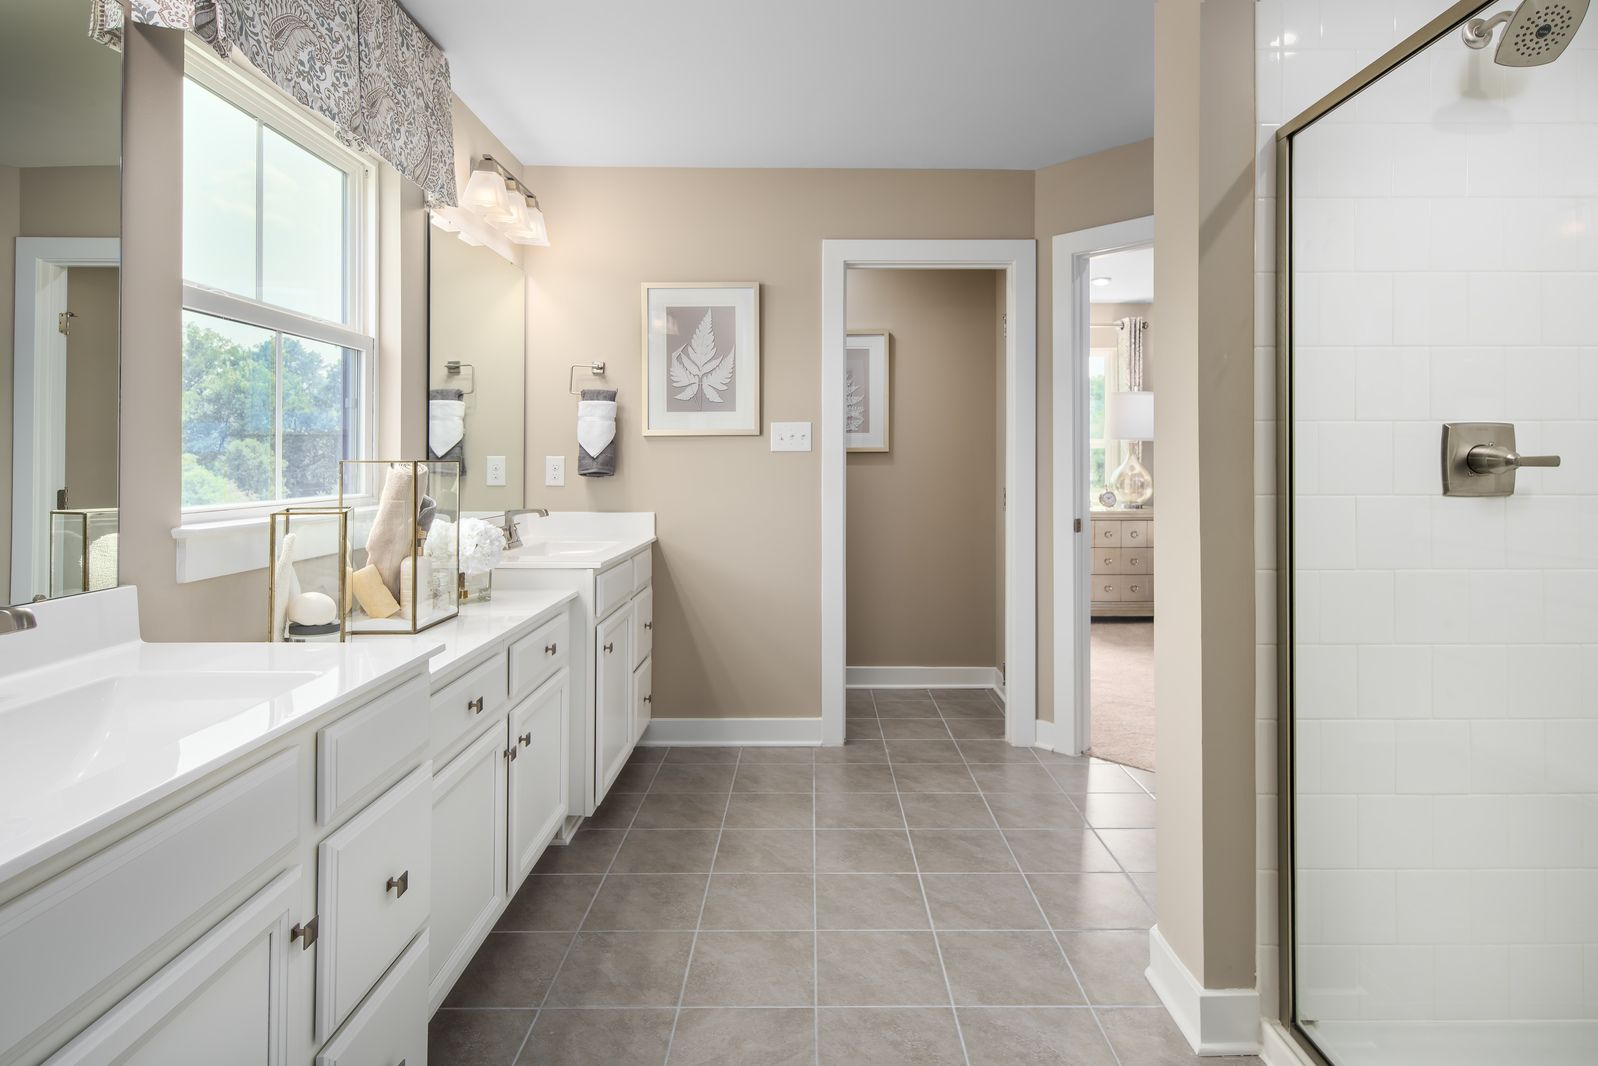 Bathroom featured in the Lehigh at Hartland By Ryan Homes in Washington, VA